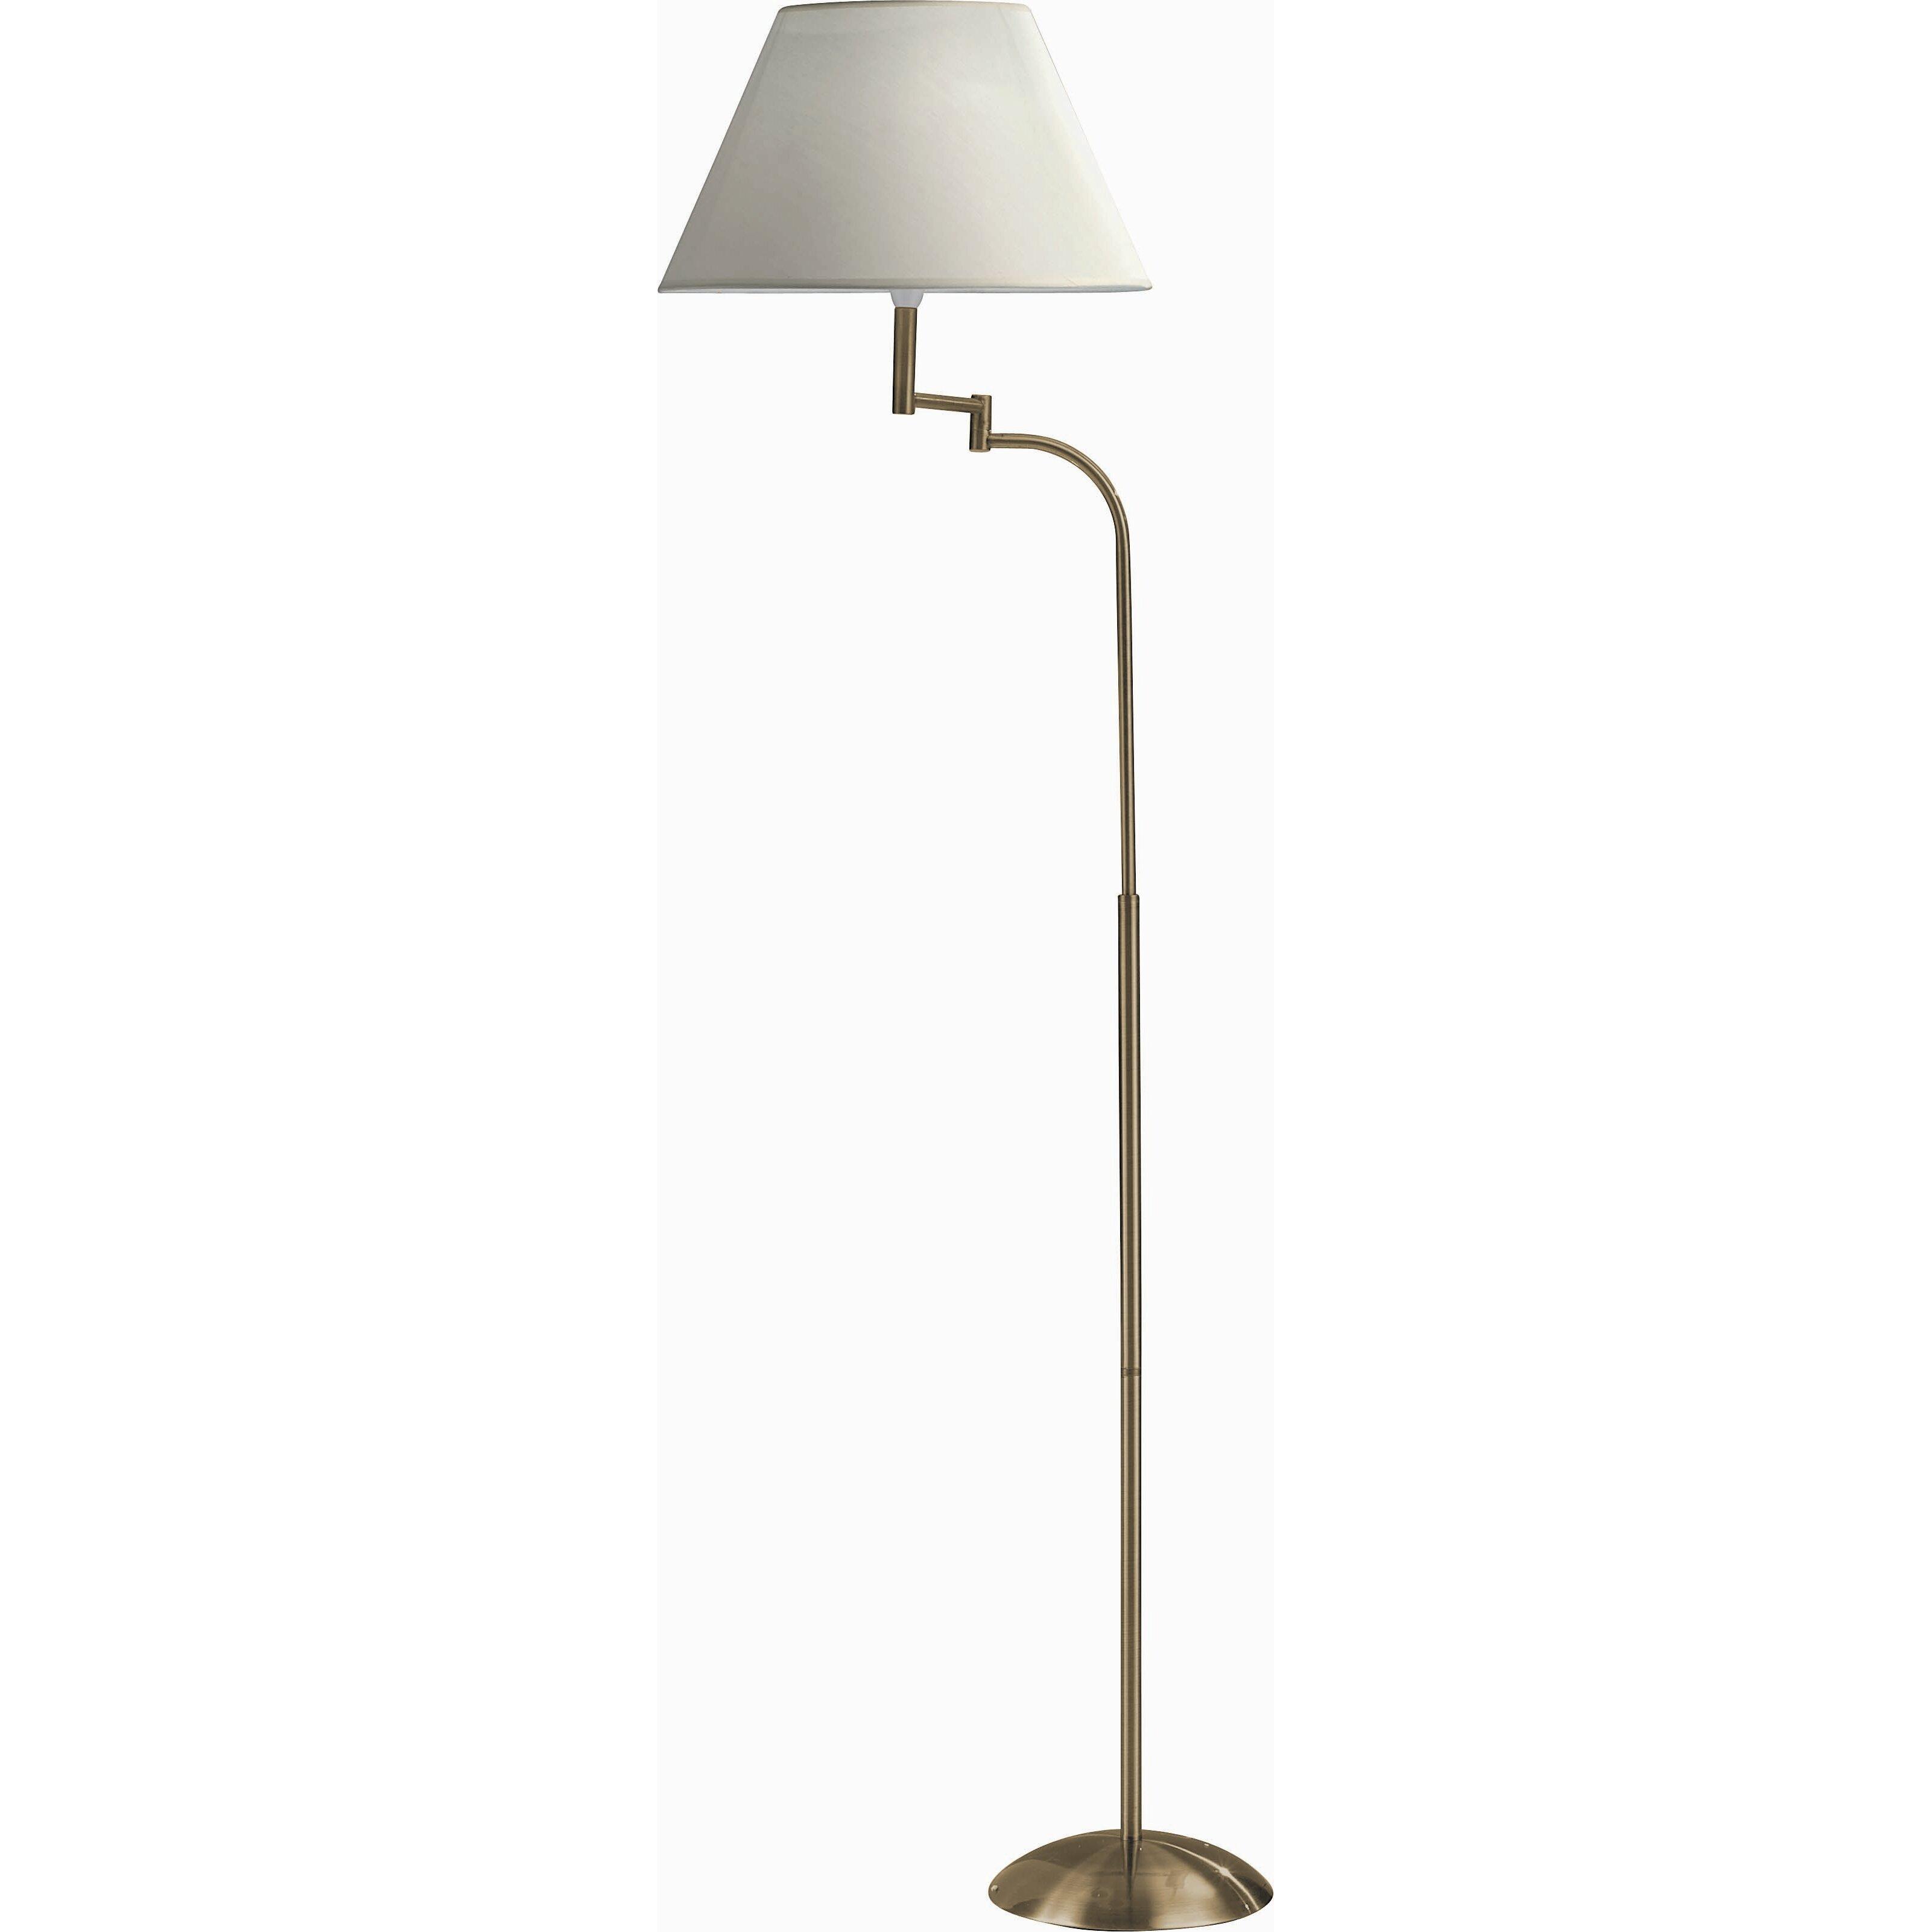 The lighting interiors group 159cm reading floor lamp for Reading floor lamp reviews